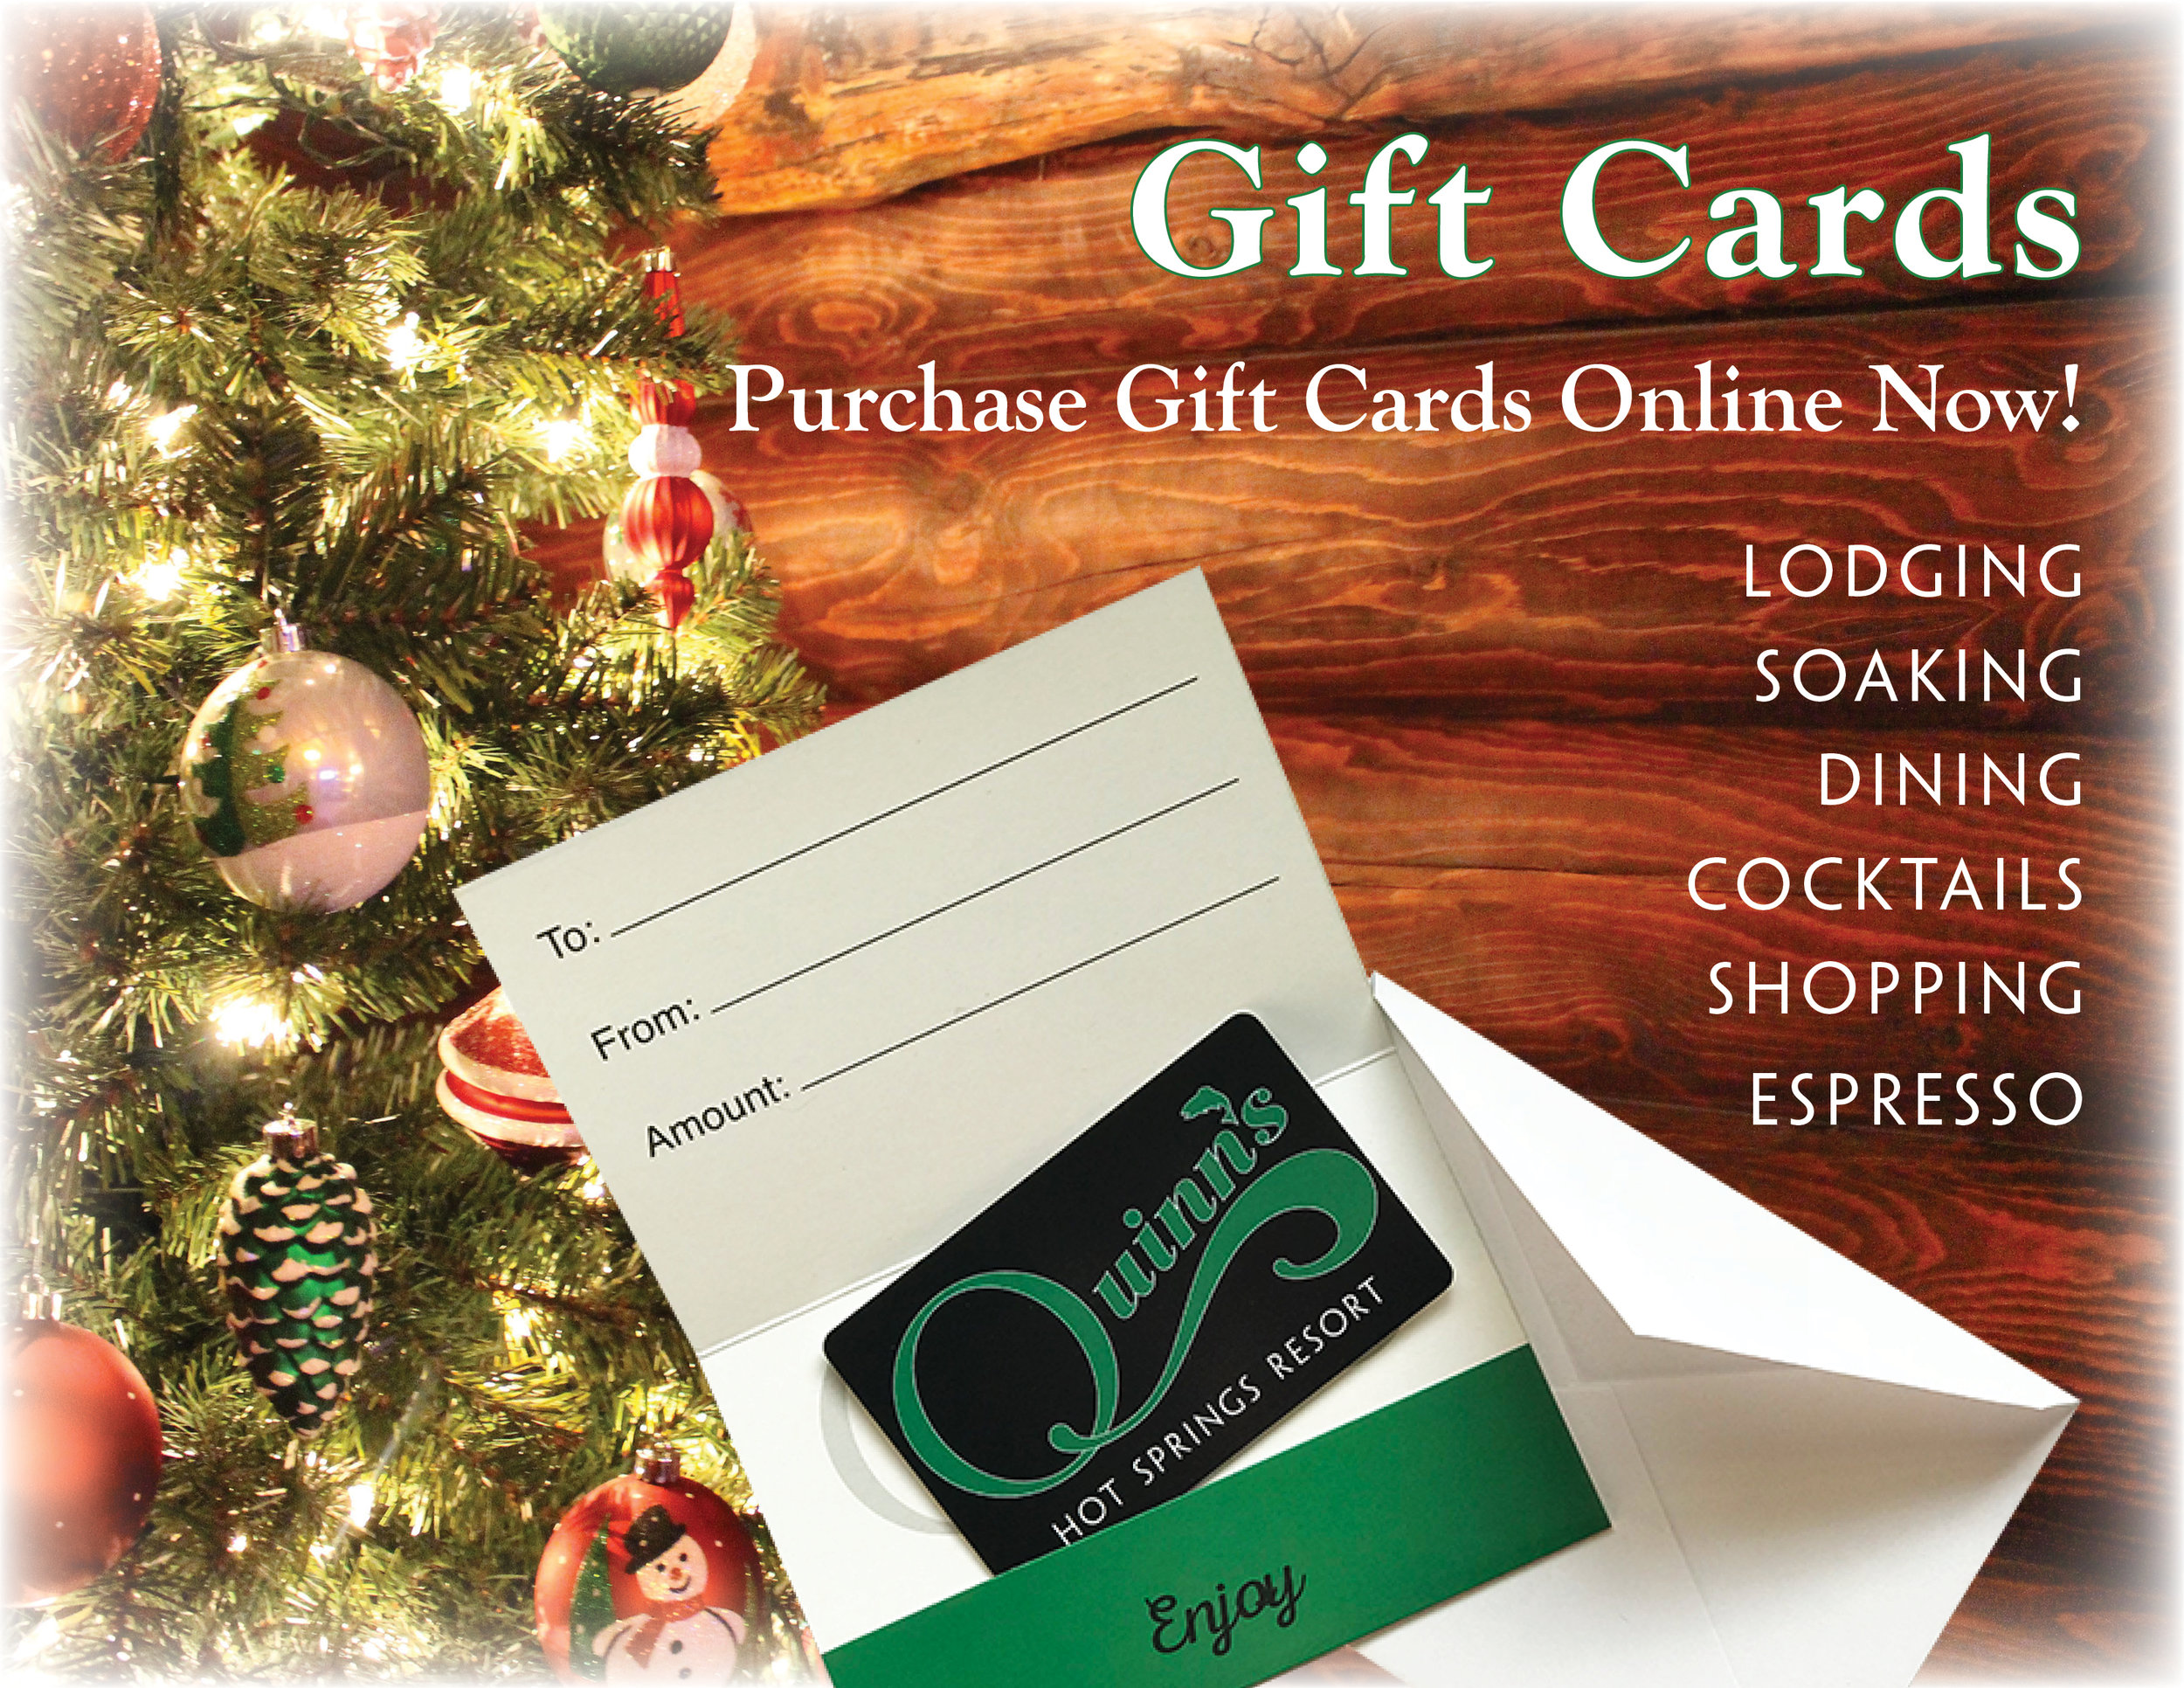 Gift Cards Image Online.jpg